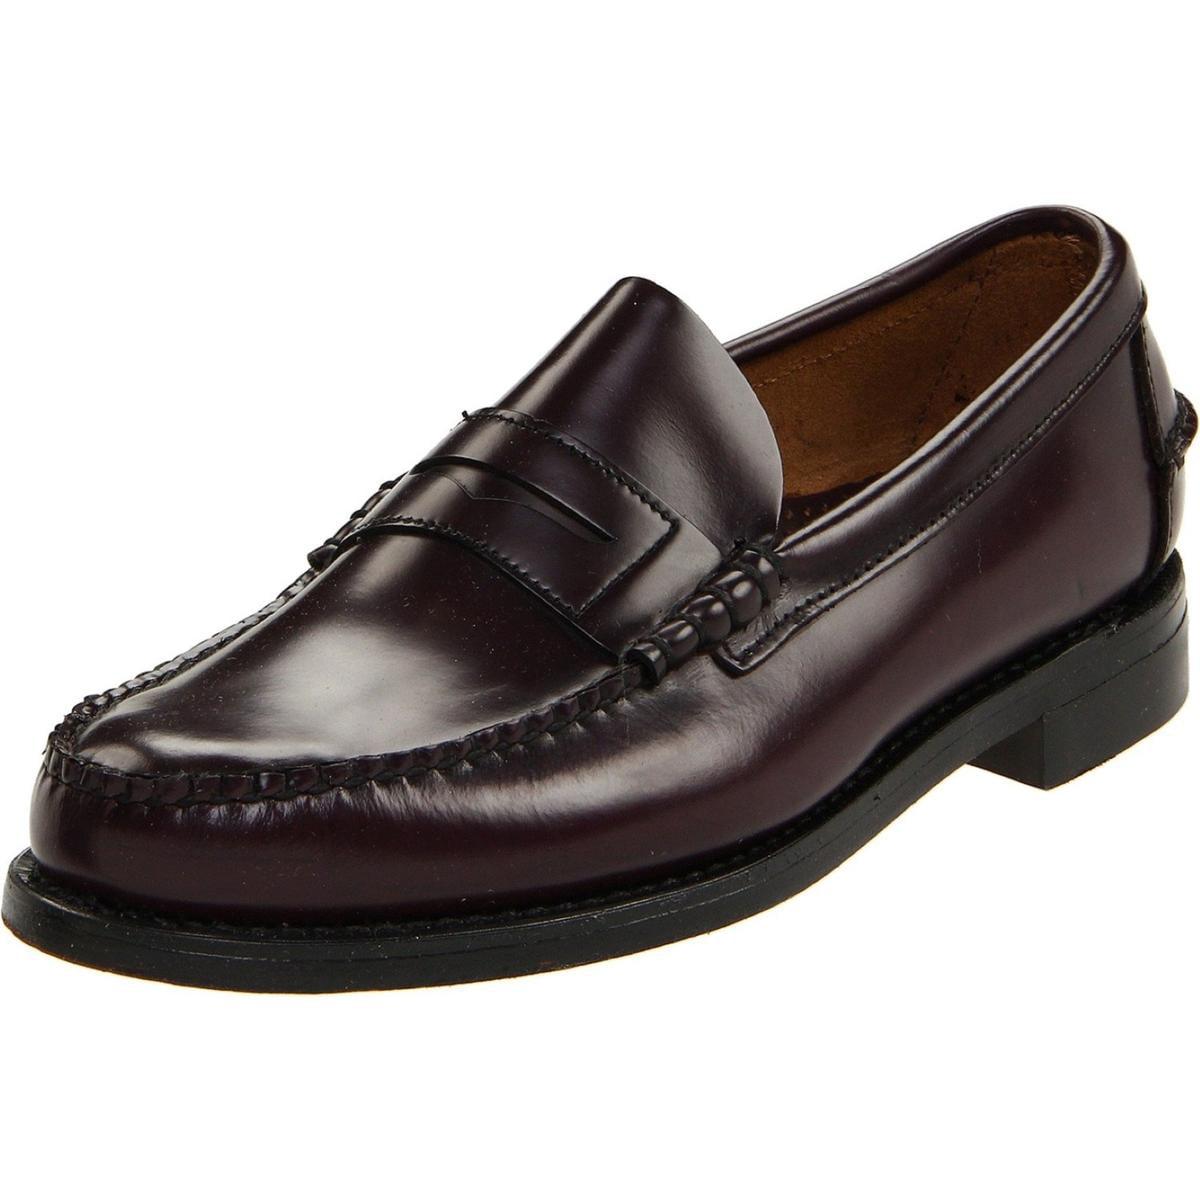 Sebago Classic Cordo Mens Cordo Loafers by Sebago